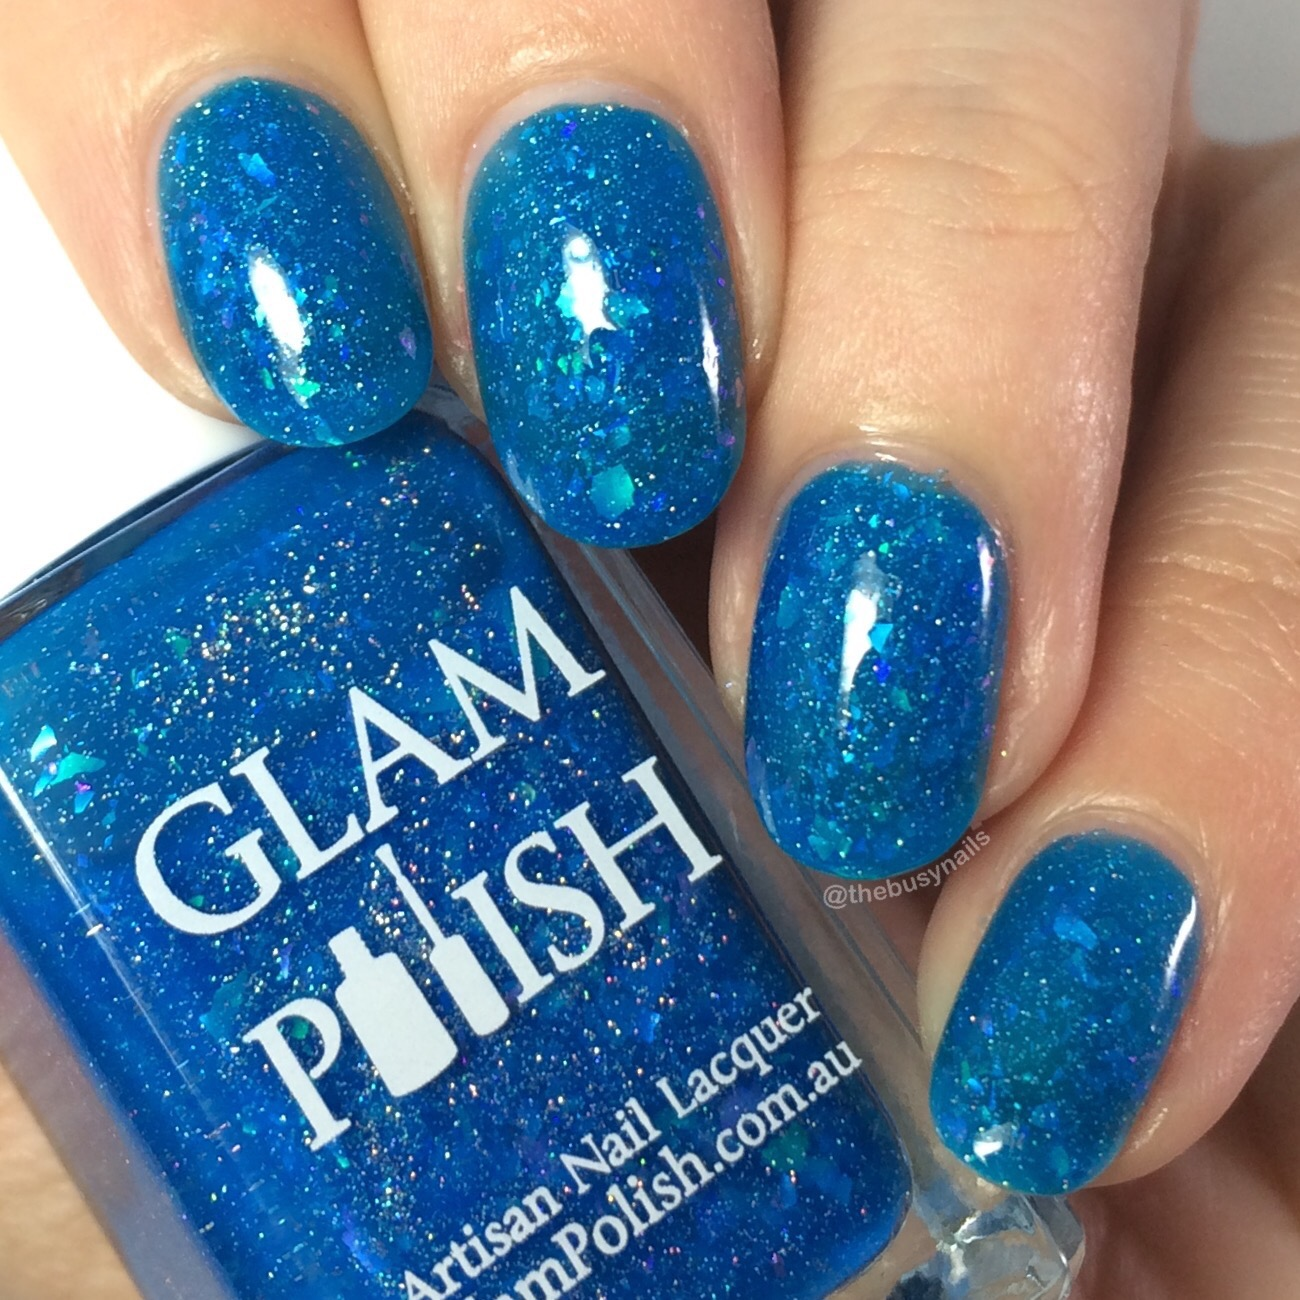 glam-polish-life-bubbles1.jpg